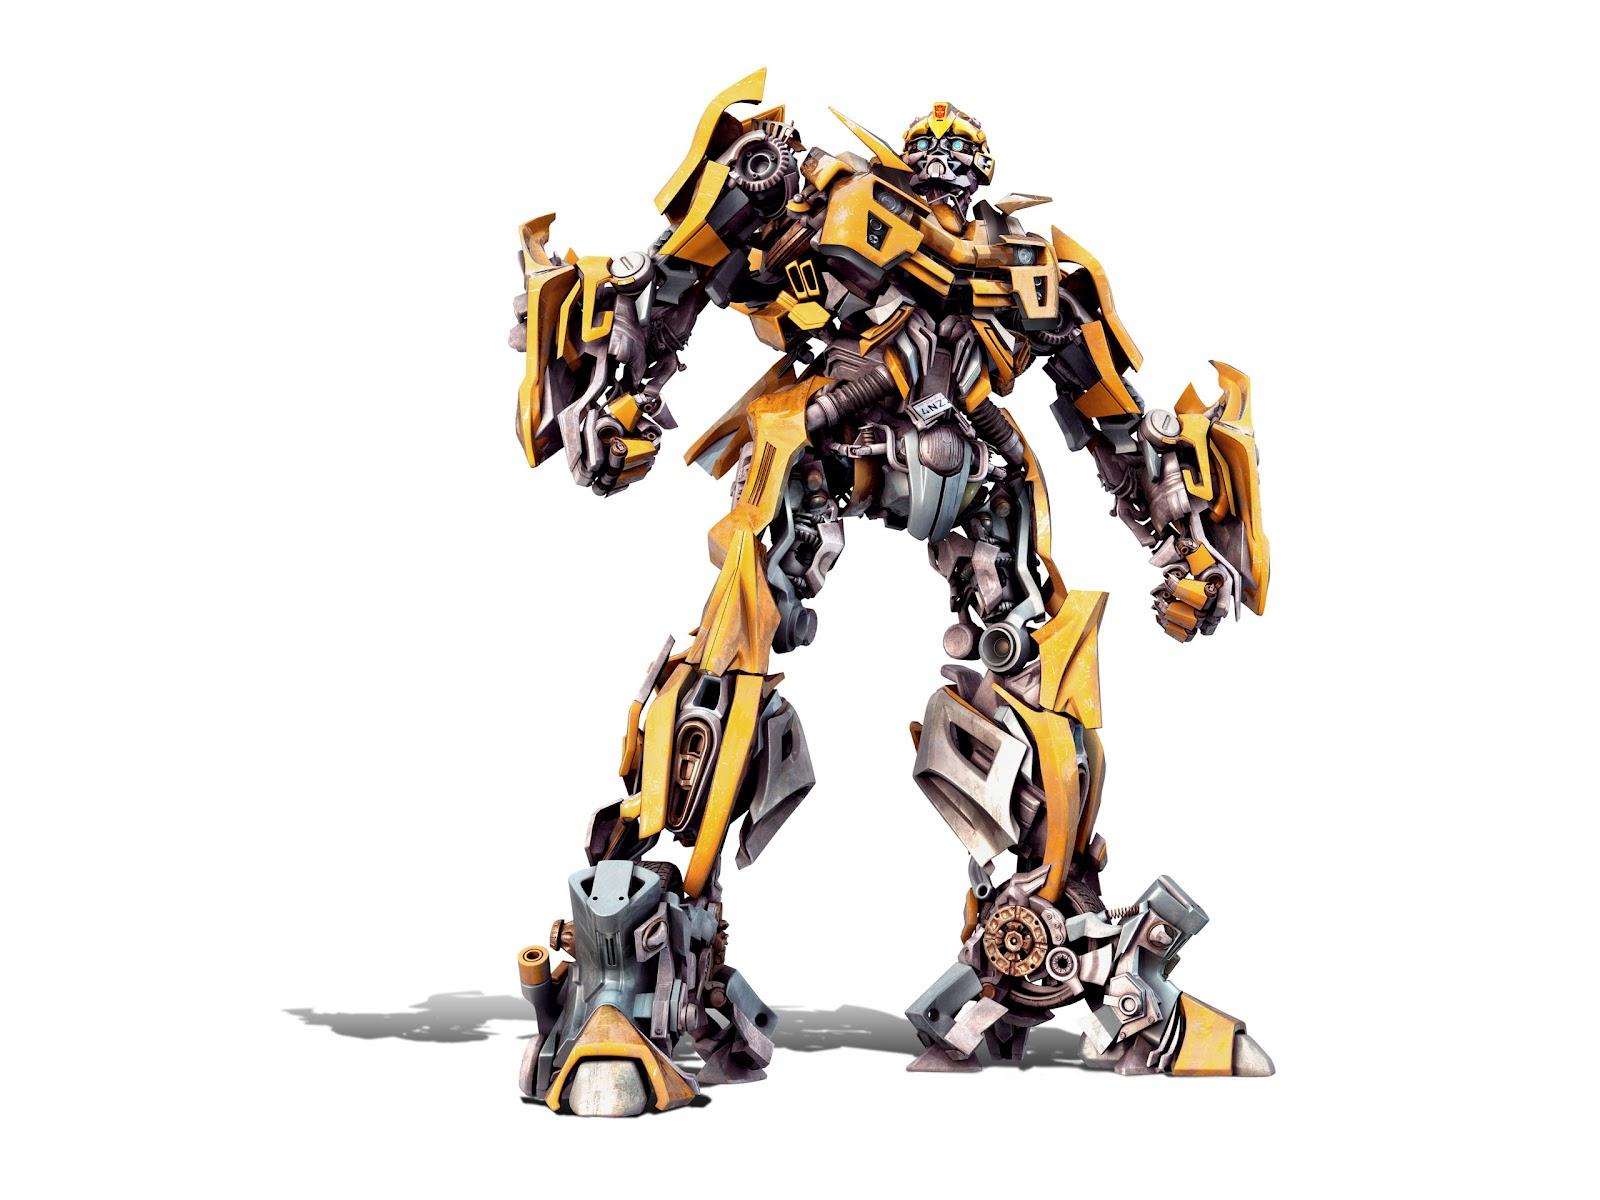 6 Beautiful Transformers Bumble Bee HD Wallpapers